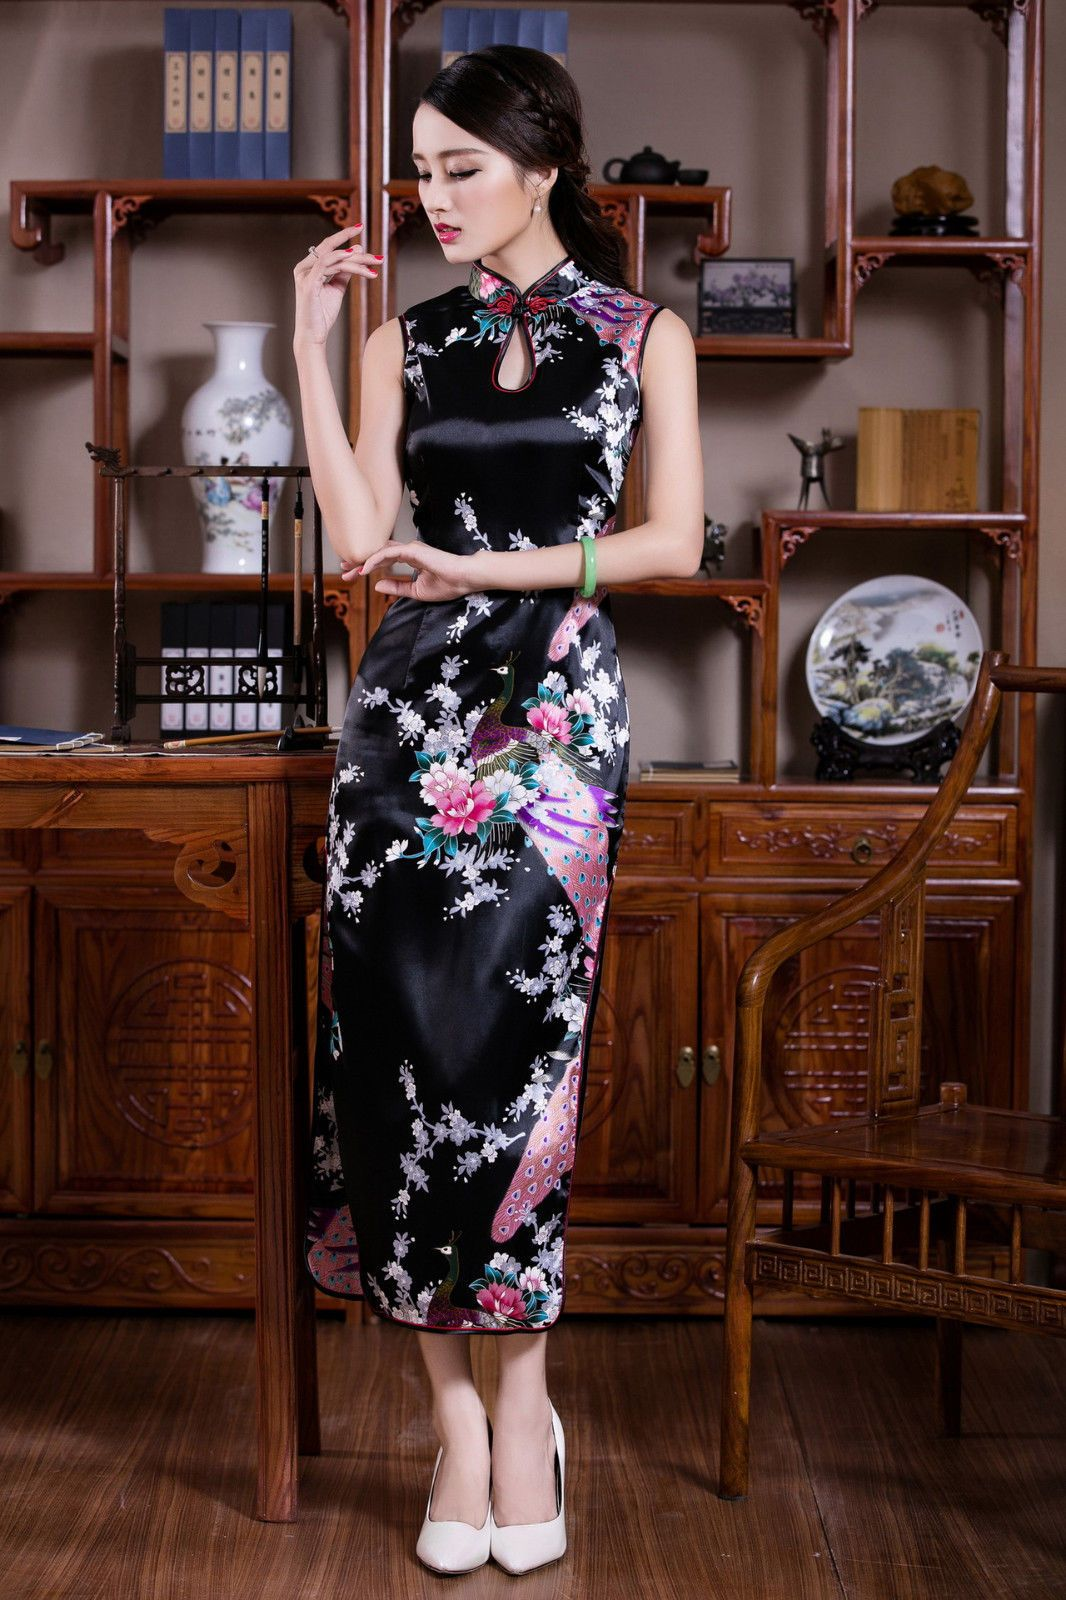 Chinese Sleeveless Women S Silk Satin Long Dress Cheong Sam Black Sz S 2xl Asian Style Dress Evening Dress Sleeveless Cheongsam Dress [ 1600 x 1066 Pixel ]